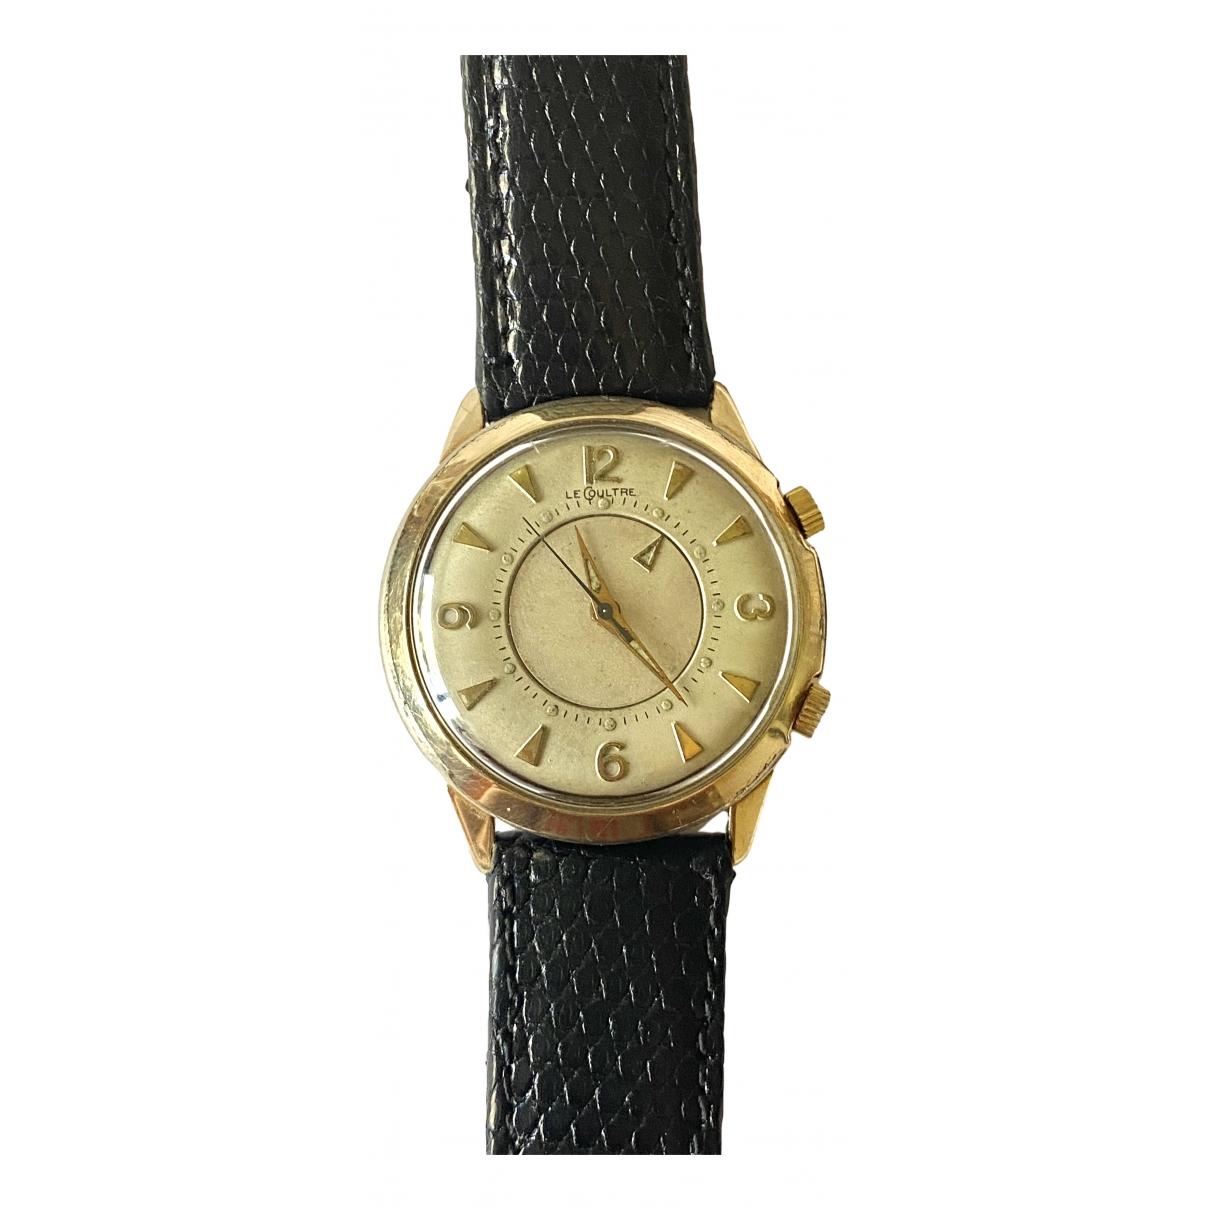 Relojes Memovox Jaeger-lecoultre